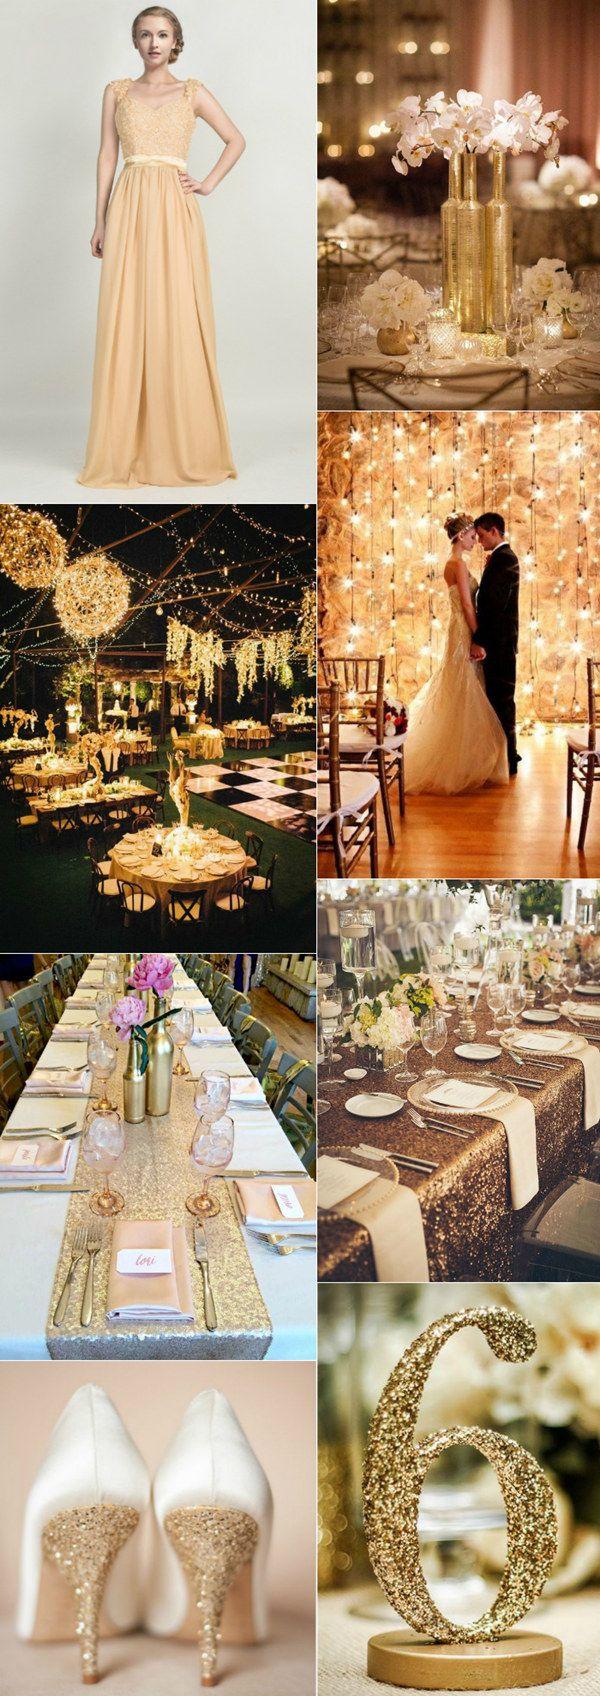 vintage gatsby 1920s themed gold wedding ideas